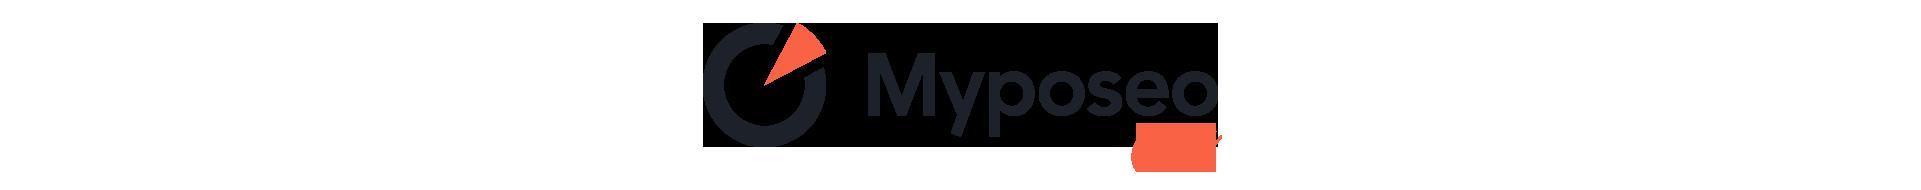 Blog myposeo